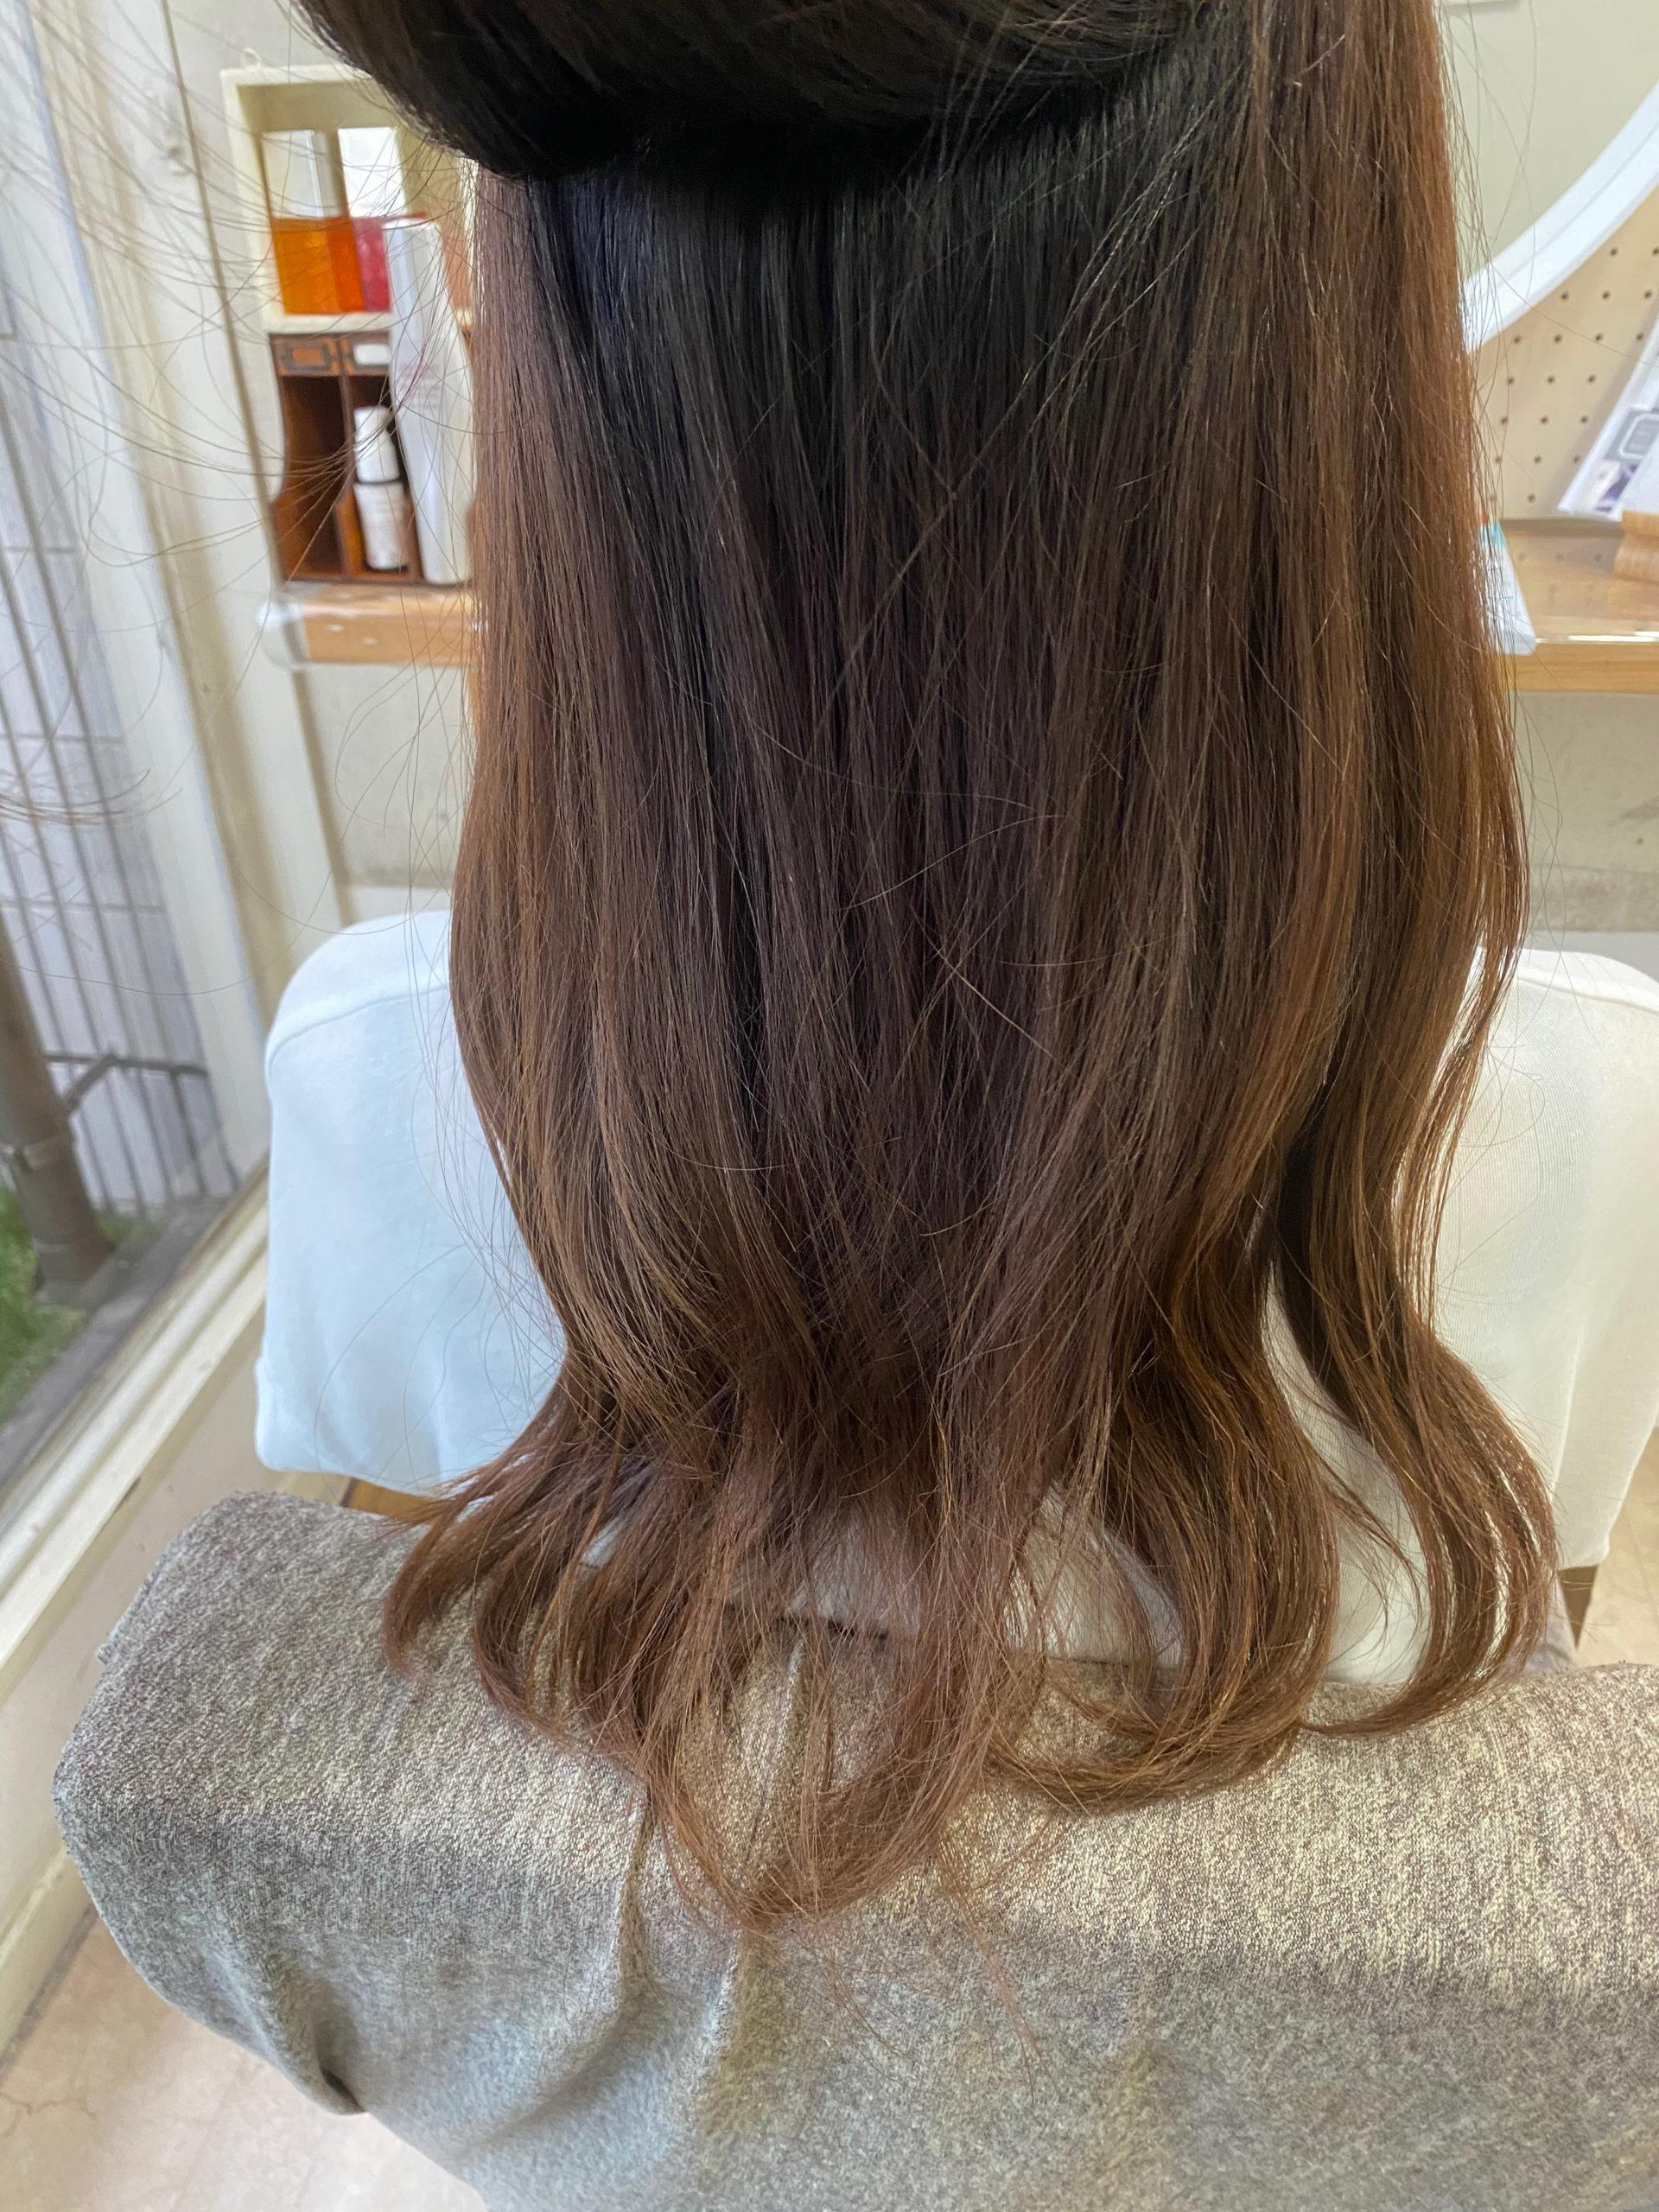 LULUトリートメント×縮毛矯正で【パーマ落とし】原宿・表参道『髪のお悩みを解決するヘアケア美容師の挑戦』